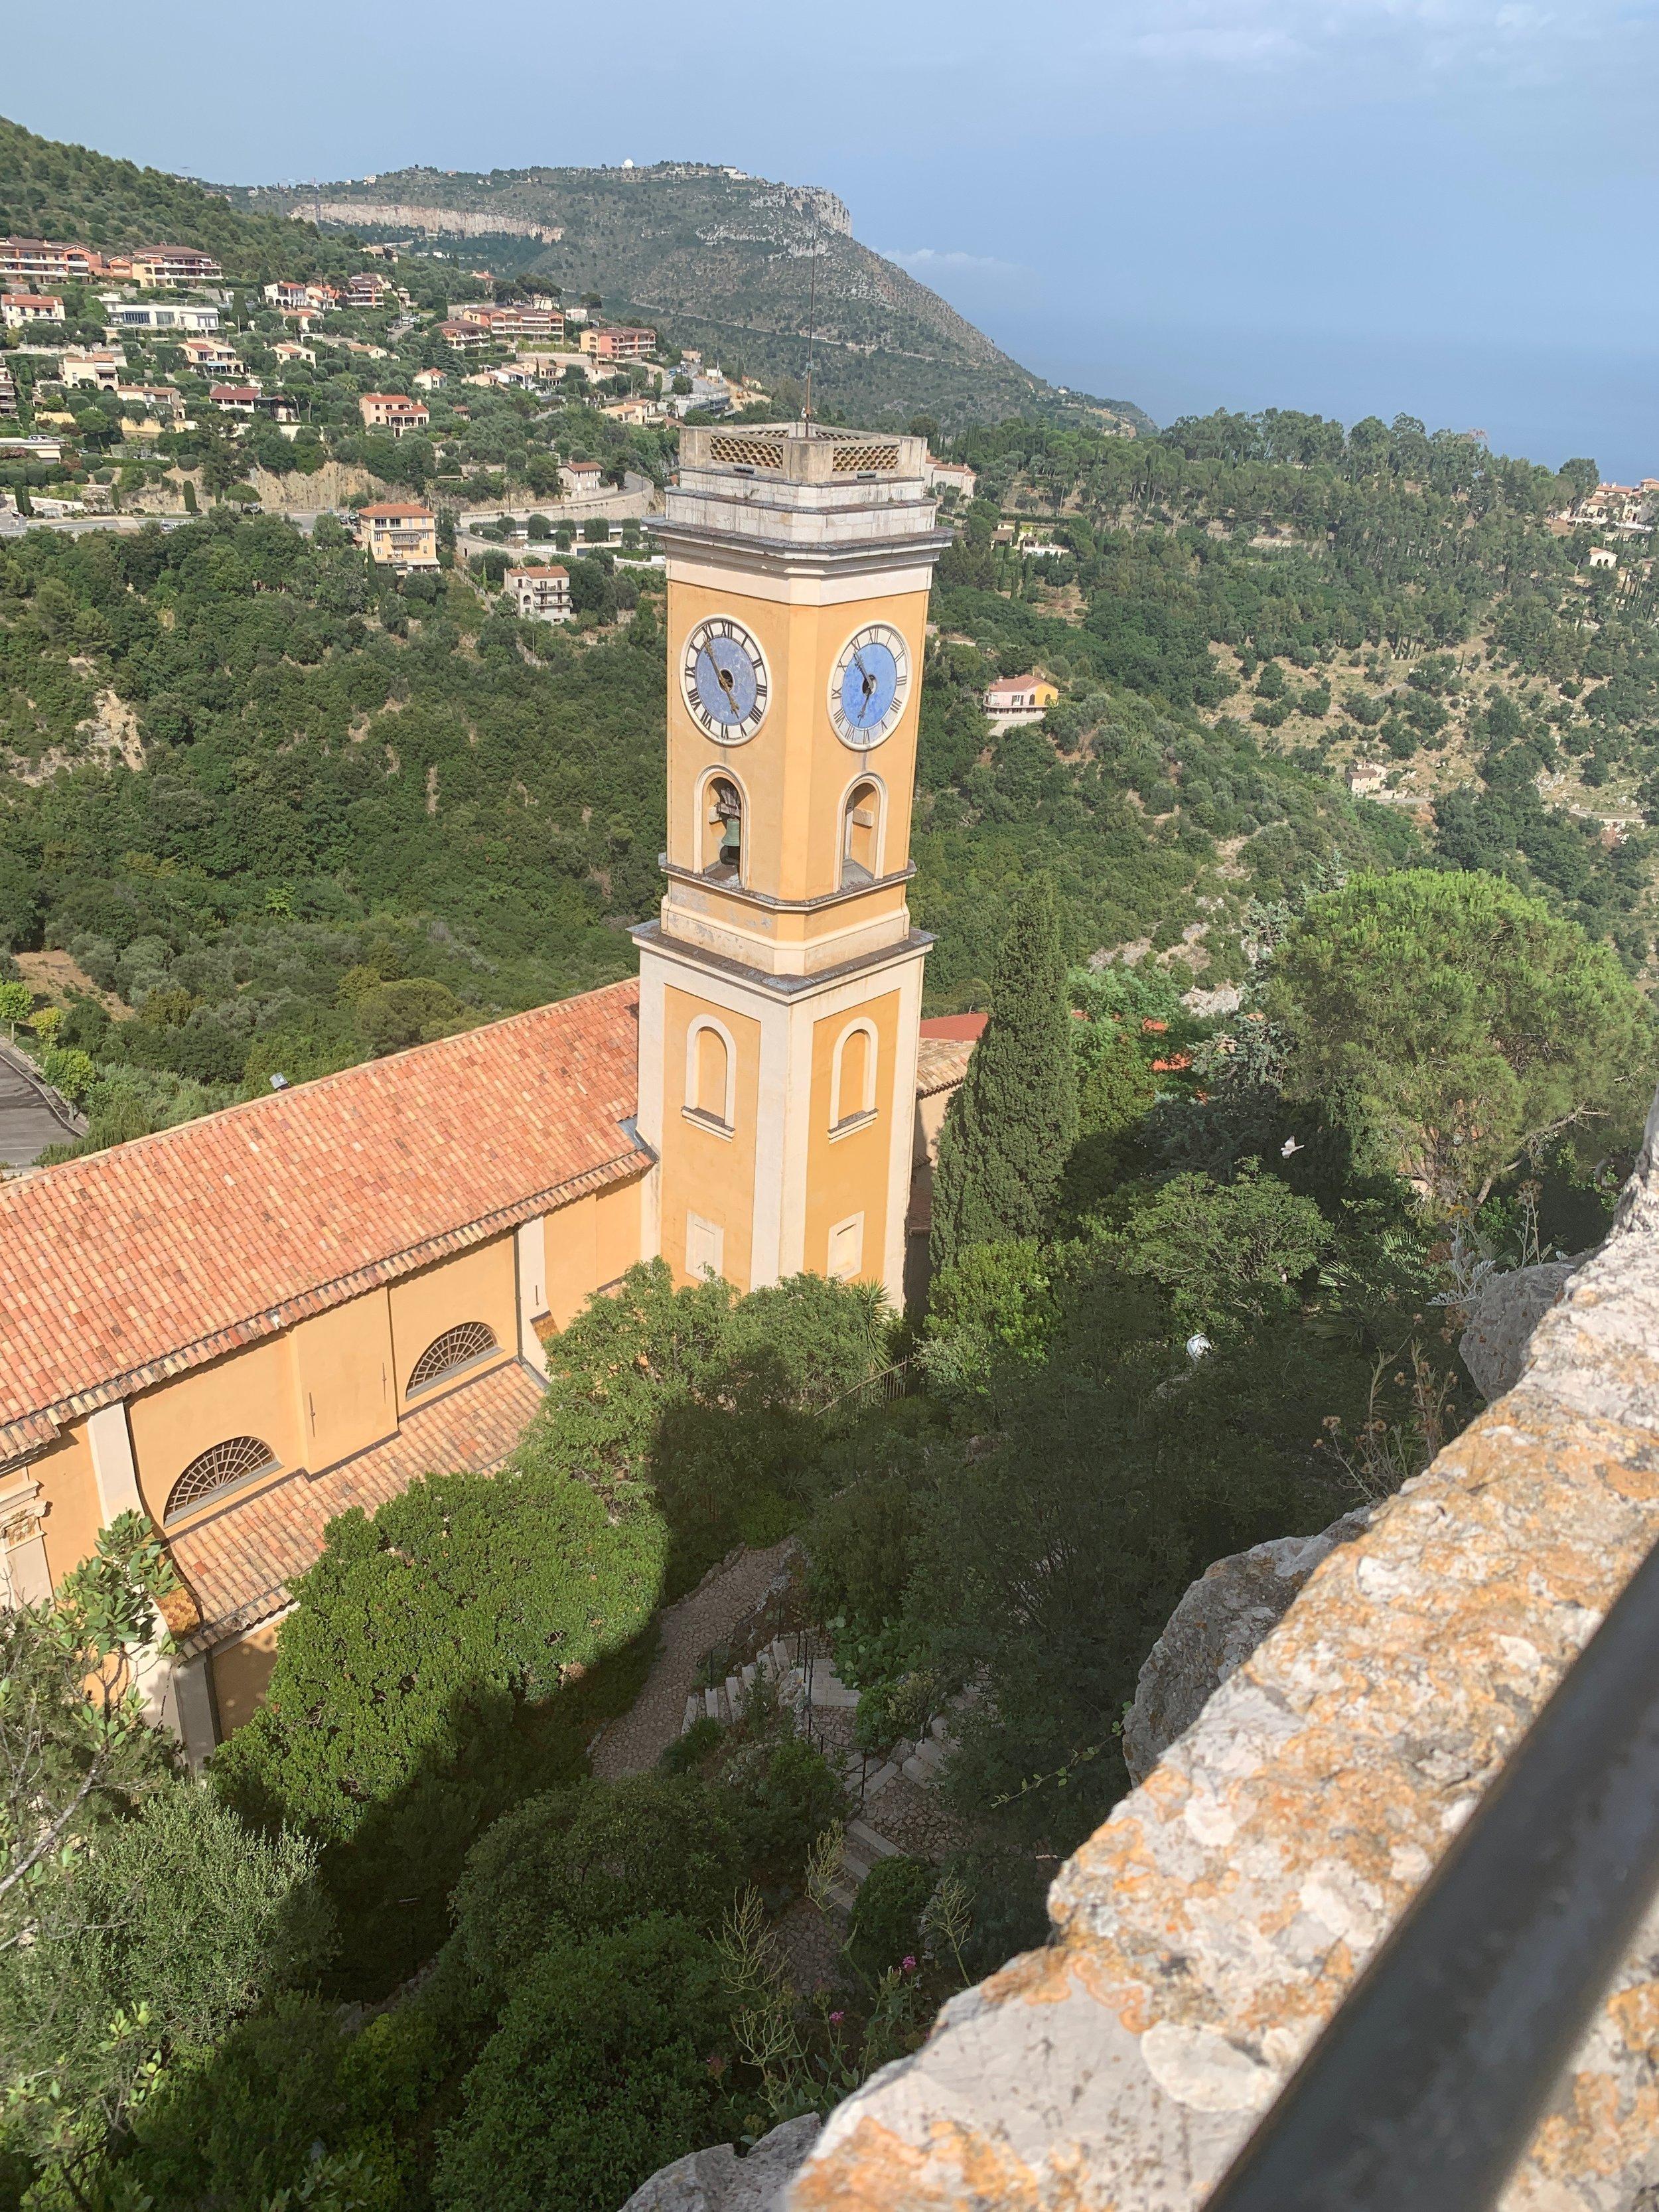 clock tower at the Catholic church